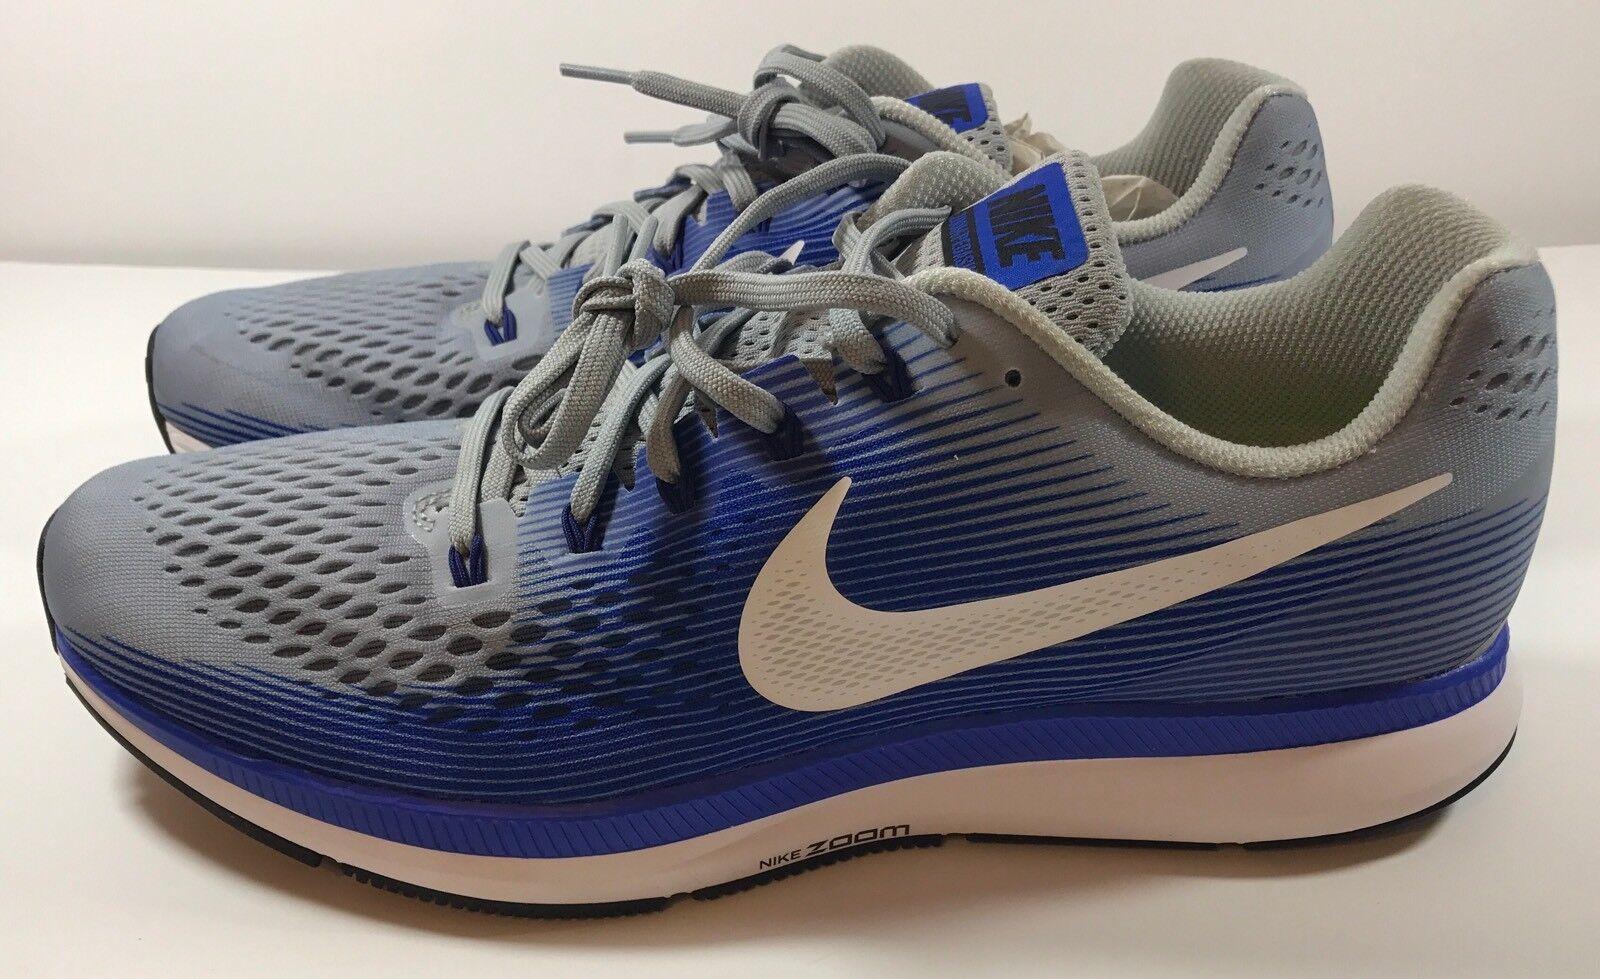 Nike air pegasus 880555-007. 34 - rennen wolfn racer blau 880555-007. pegasus bdaadb